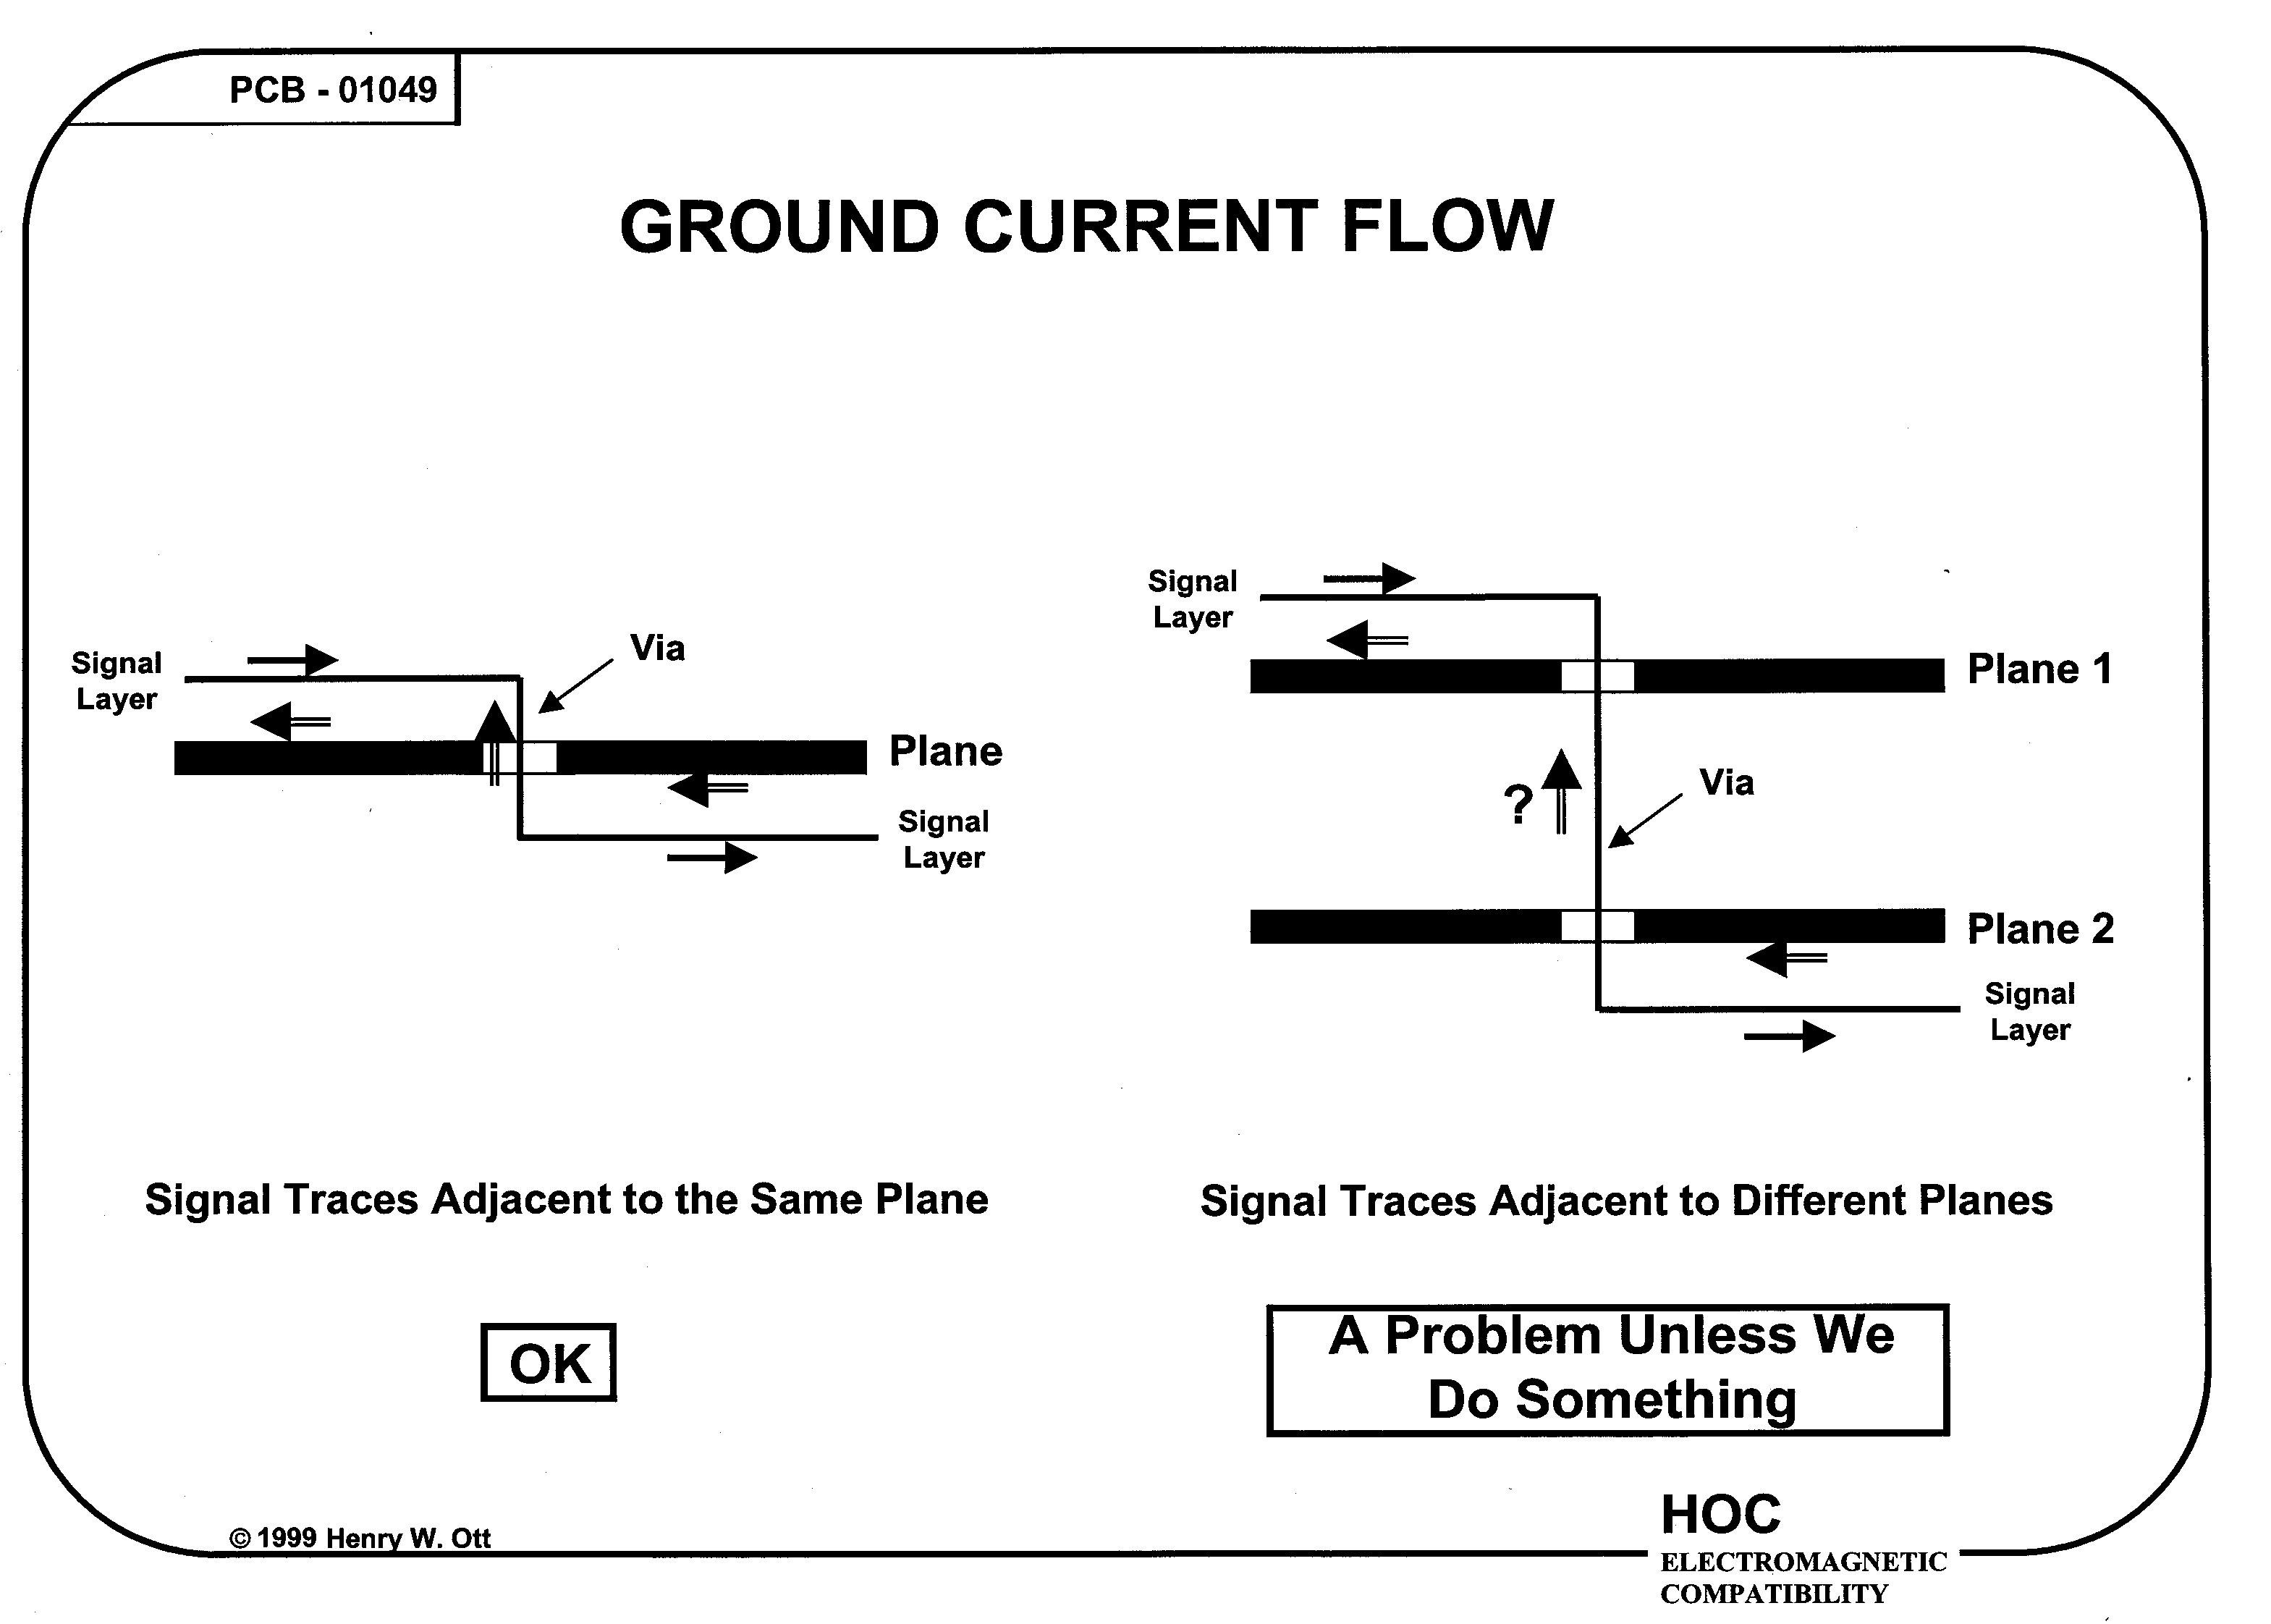 Wiring Diagram for 230v Single Phase Motor Beautiful Single Phase Motor Wiring Diagram with Capacitor Impremedia